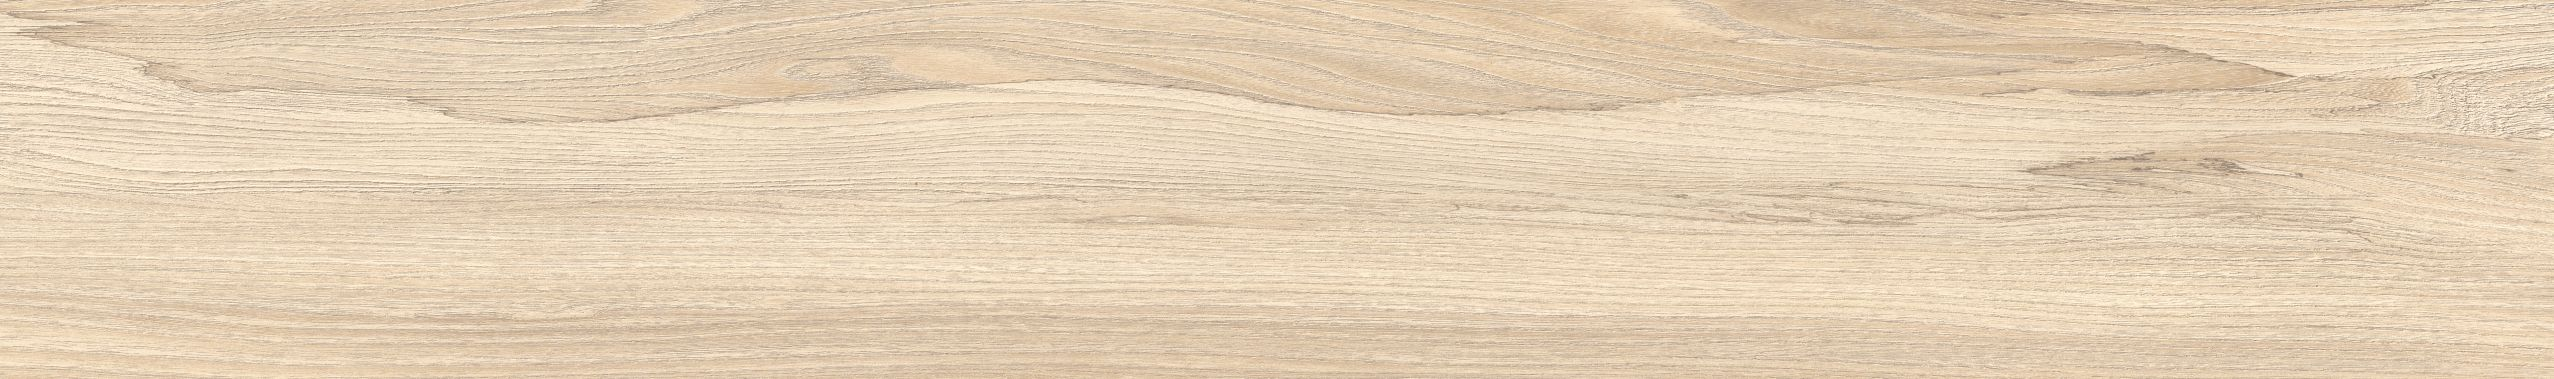 Panele winylowe LVT modulari ® WOOD DRYBACK 19,6 x 132 cm 22220